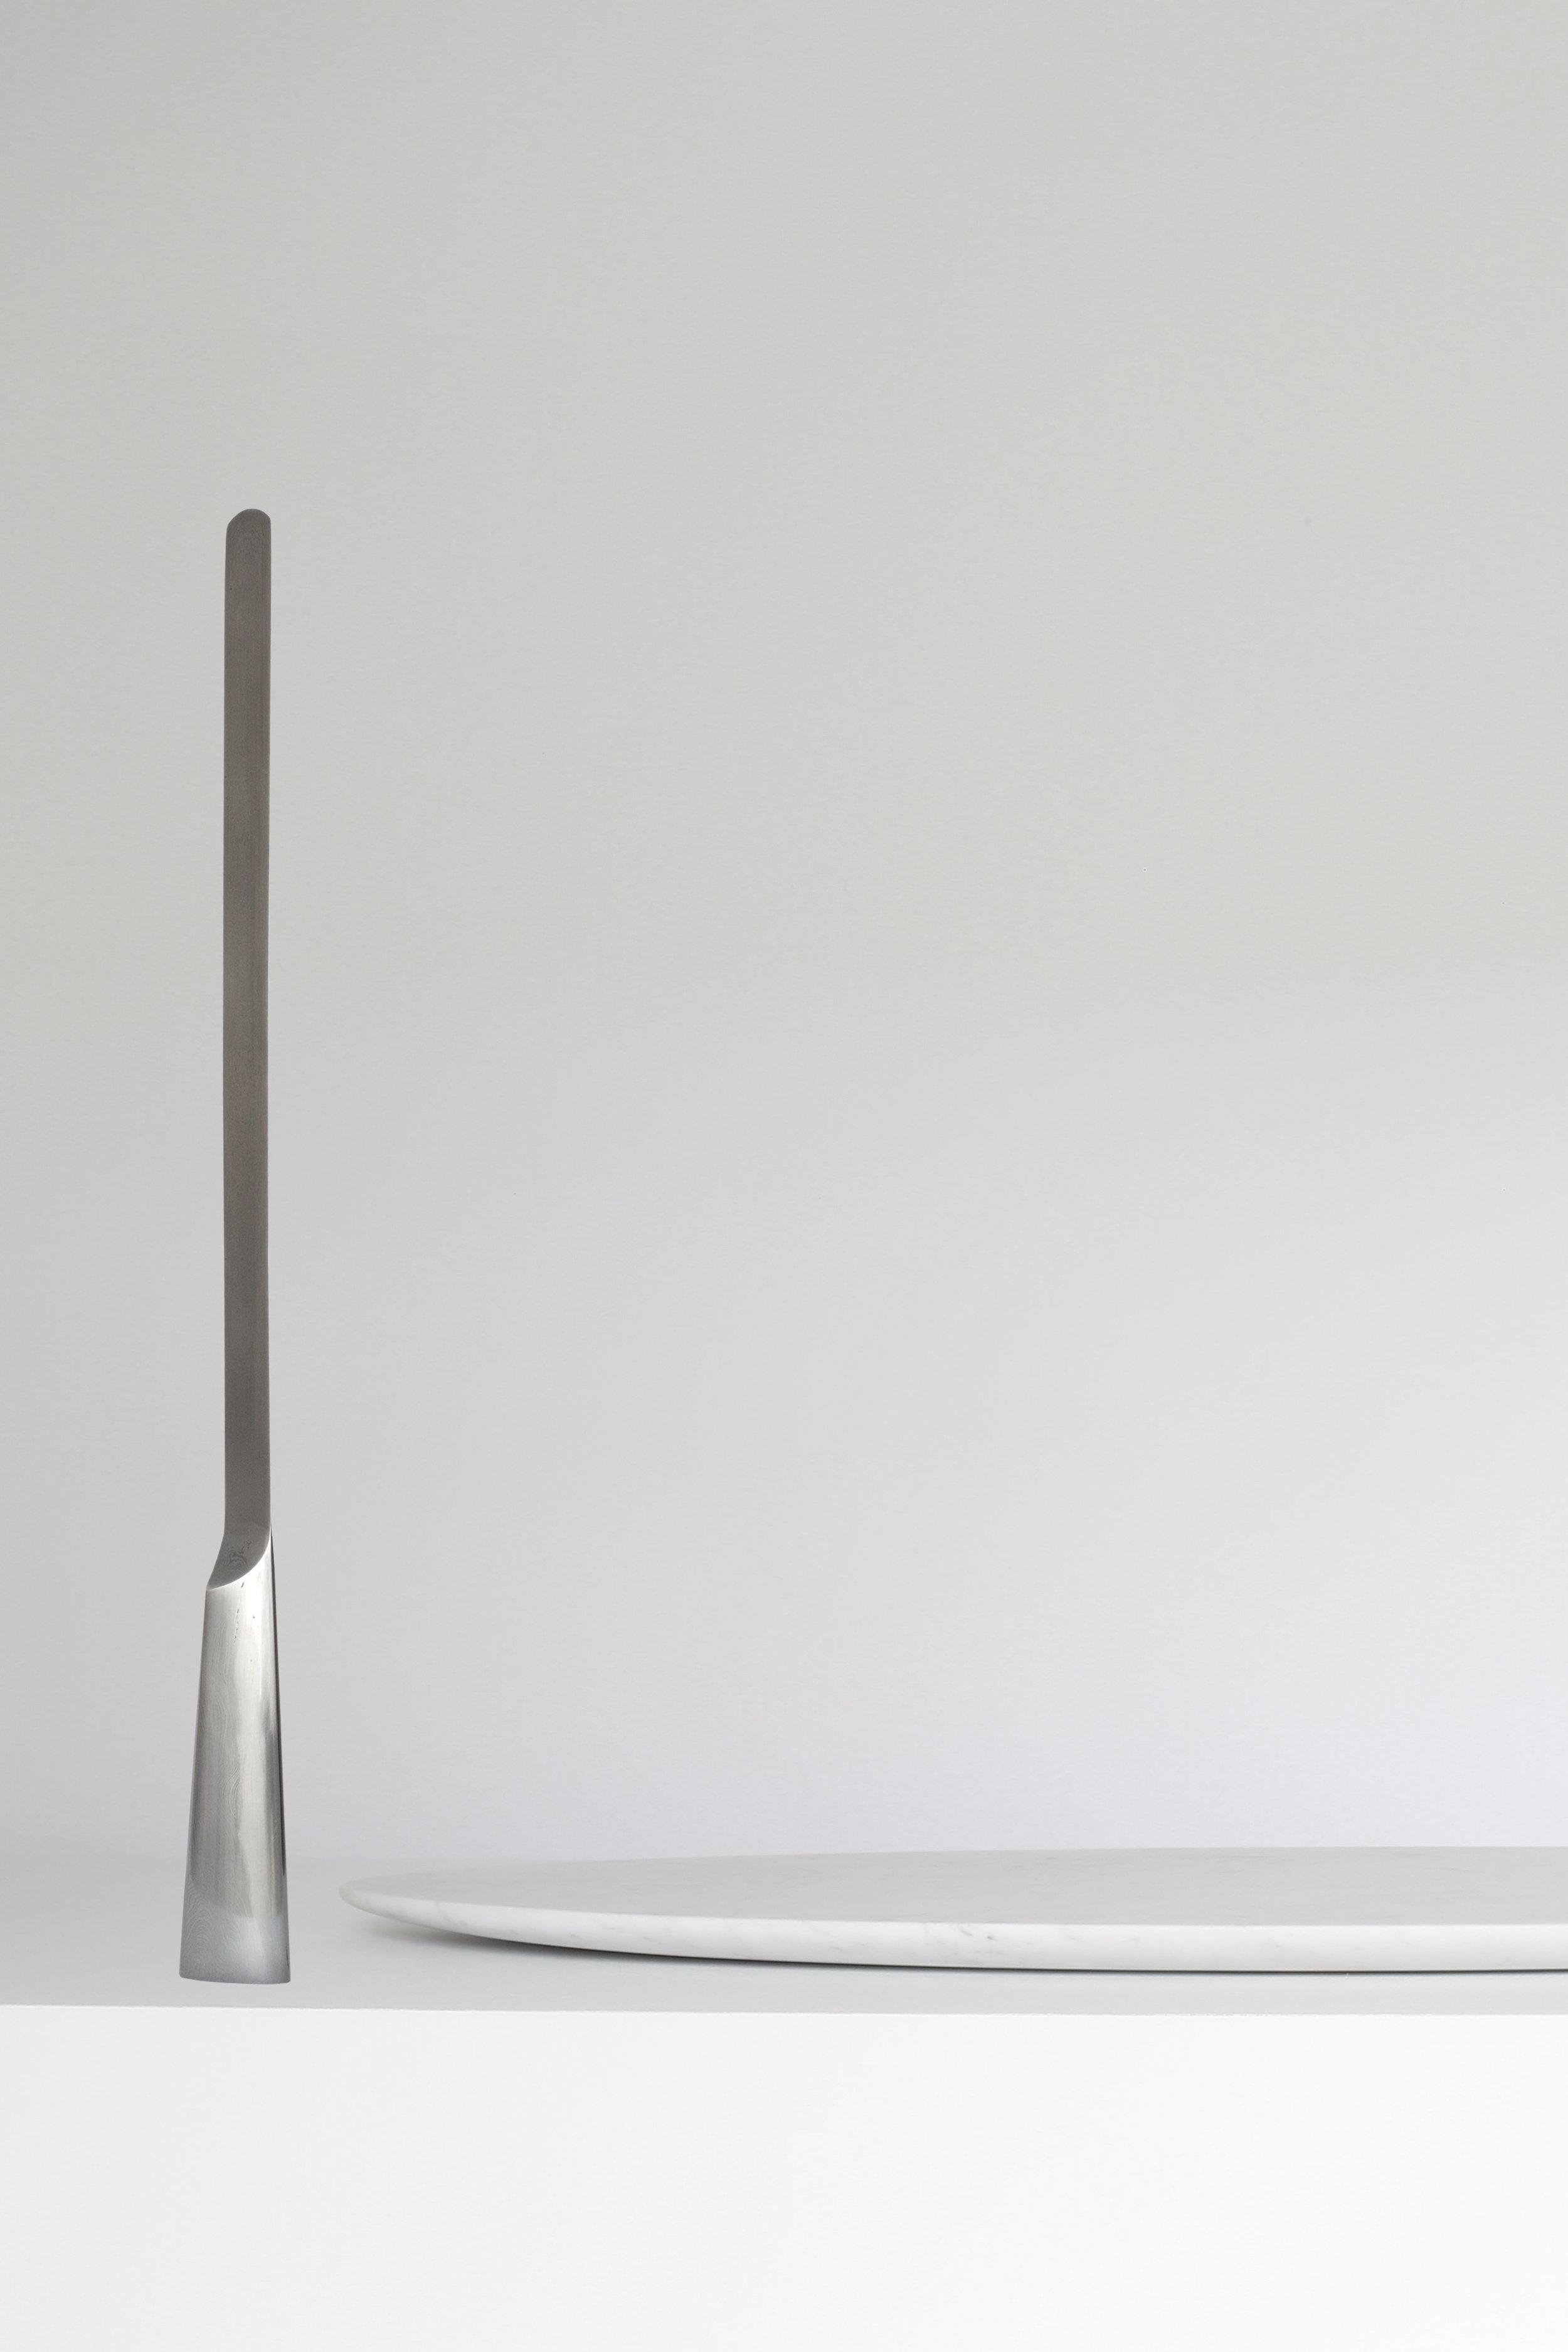 valerianelazardknife.jpg